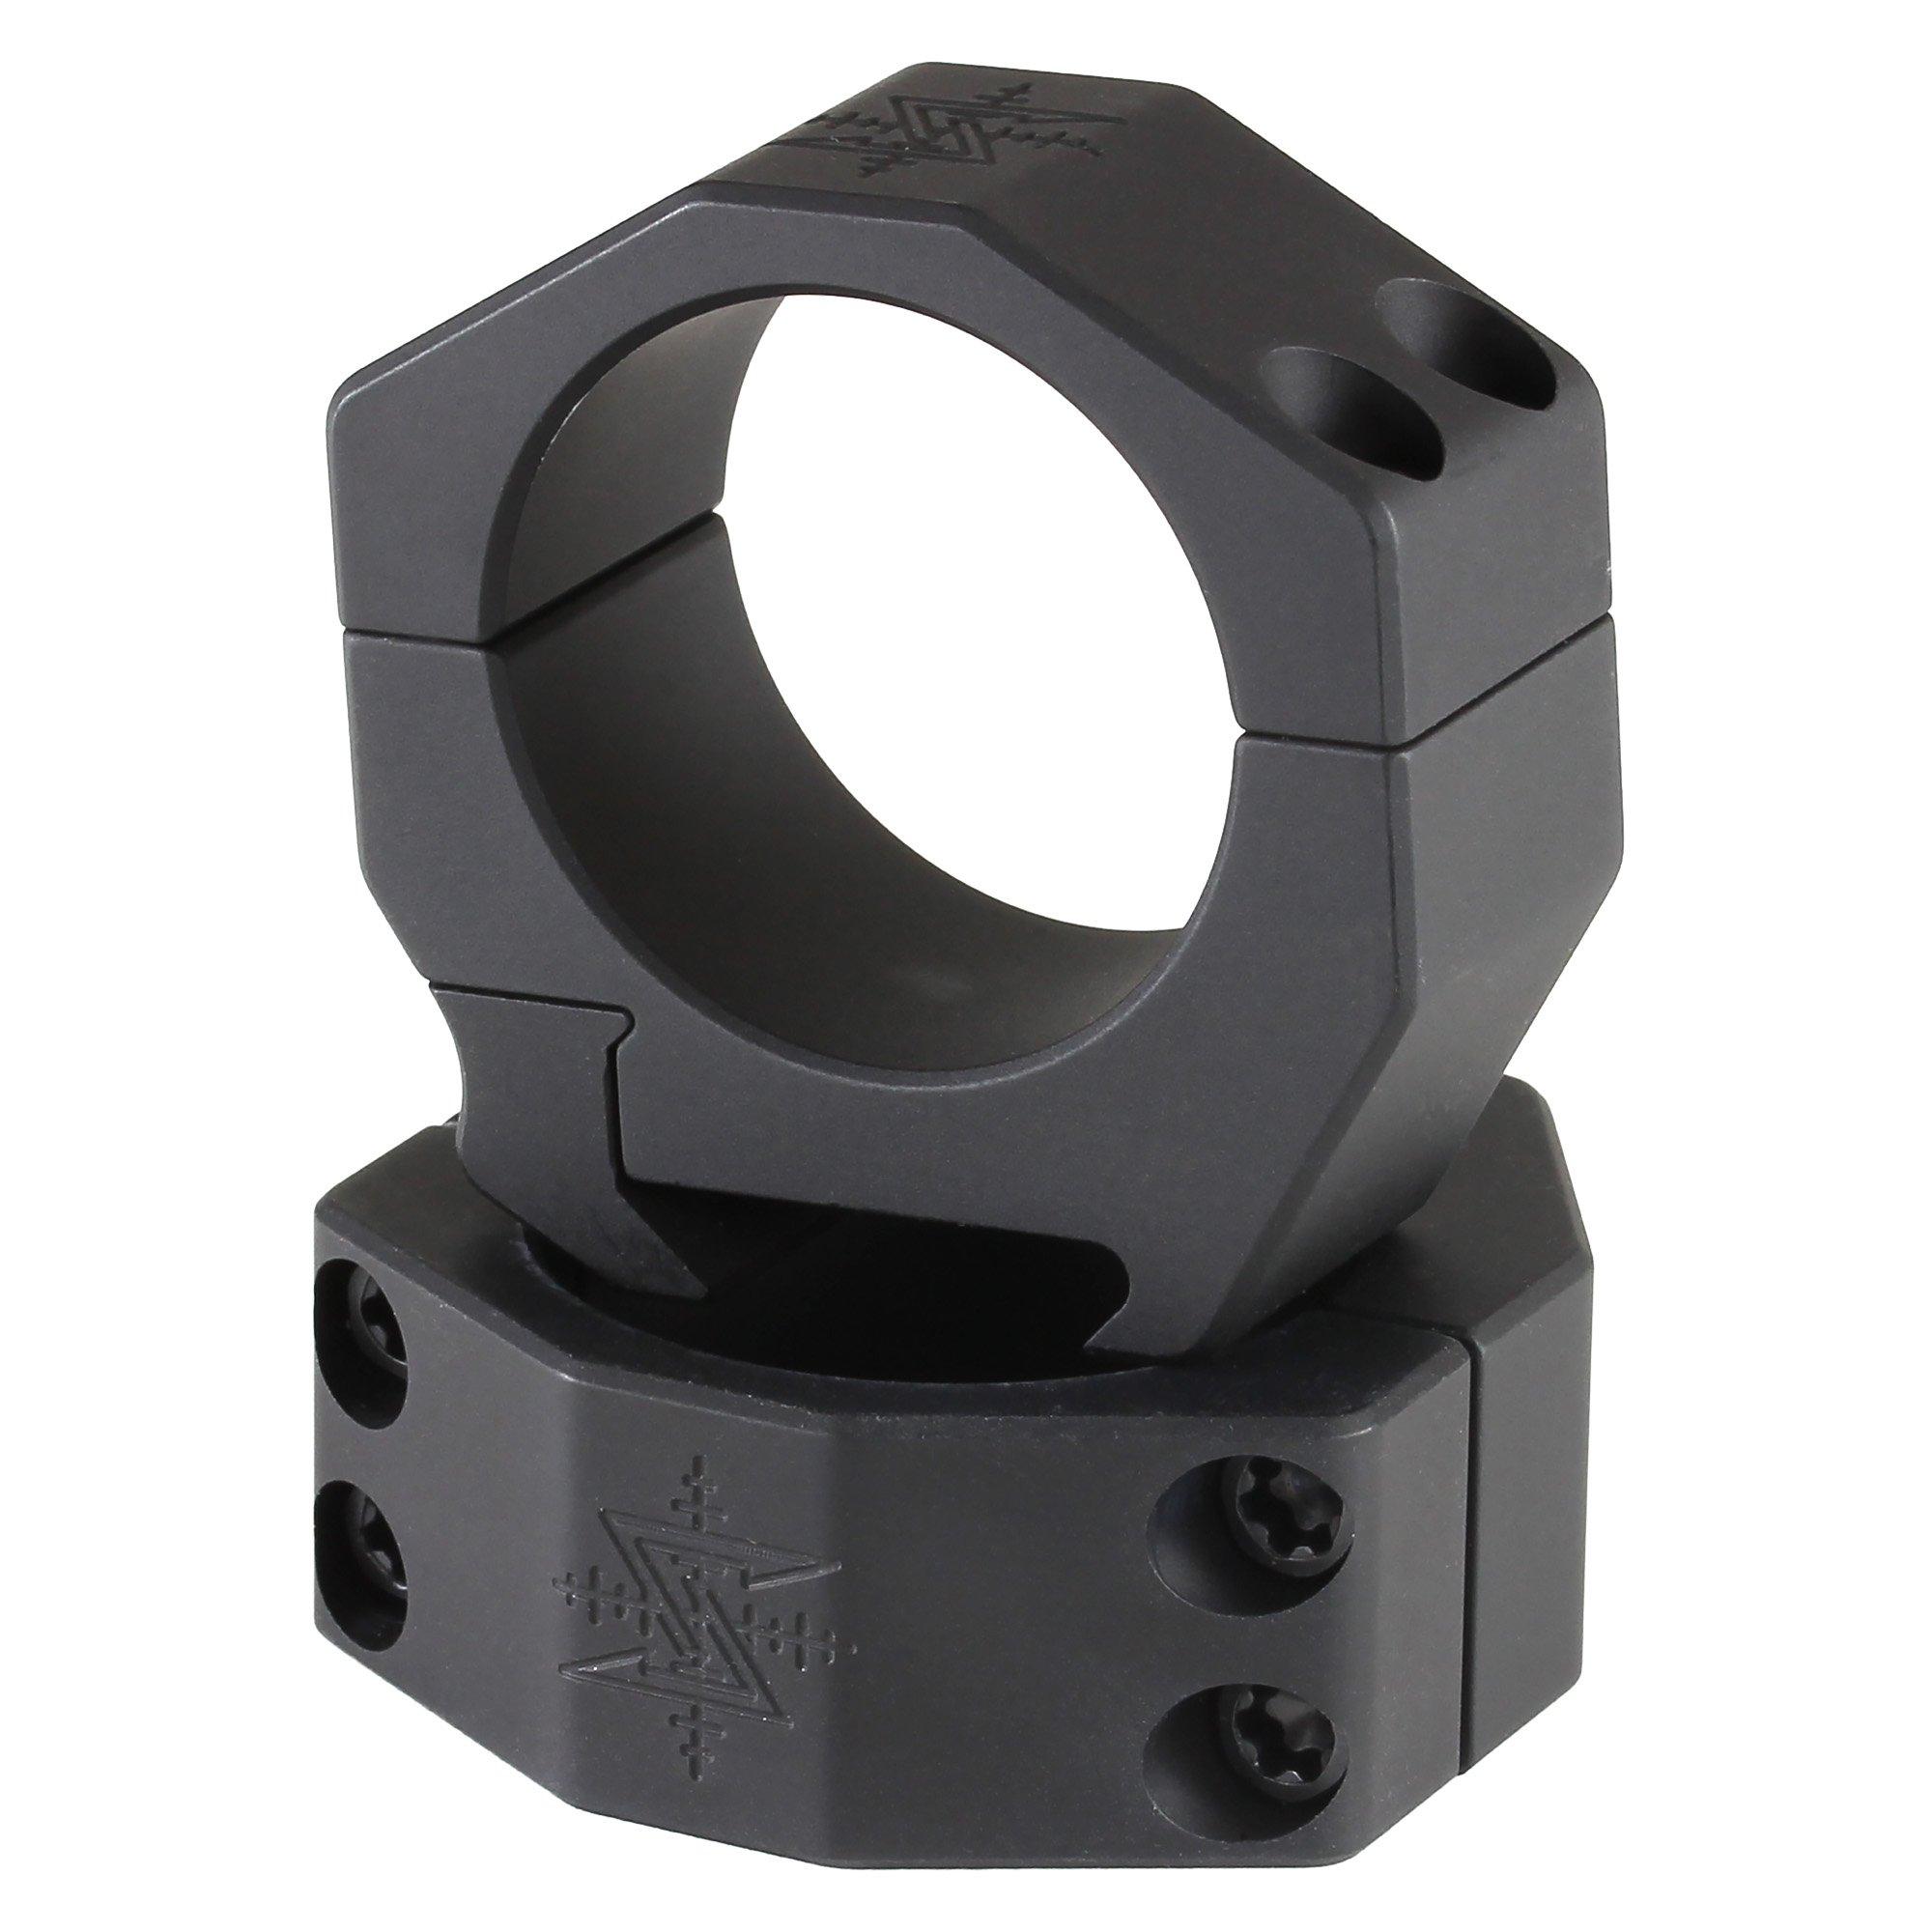 Seekins Precision 34mm Tube .92'' Low High 4 Cap Screw Scope Ring by Seekins Precision